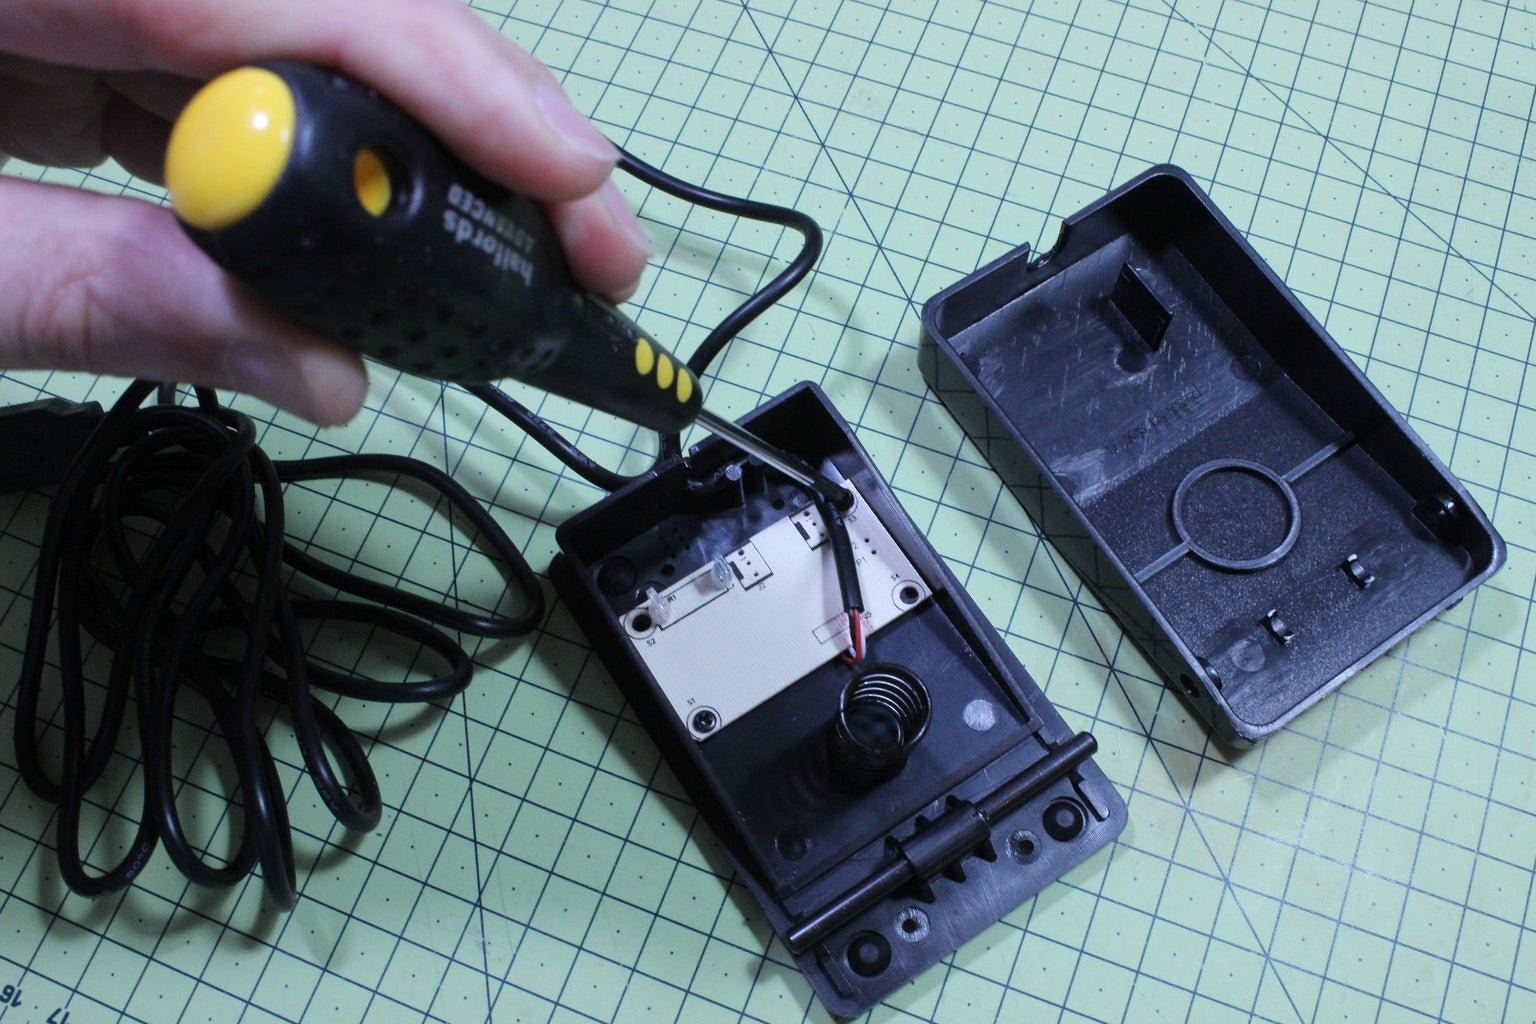 Prepare the USB Foot Pedals